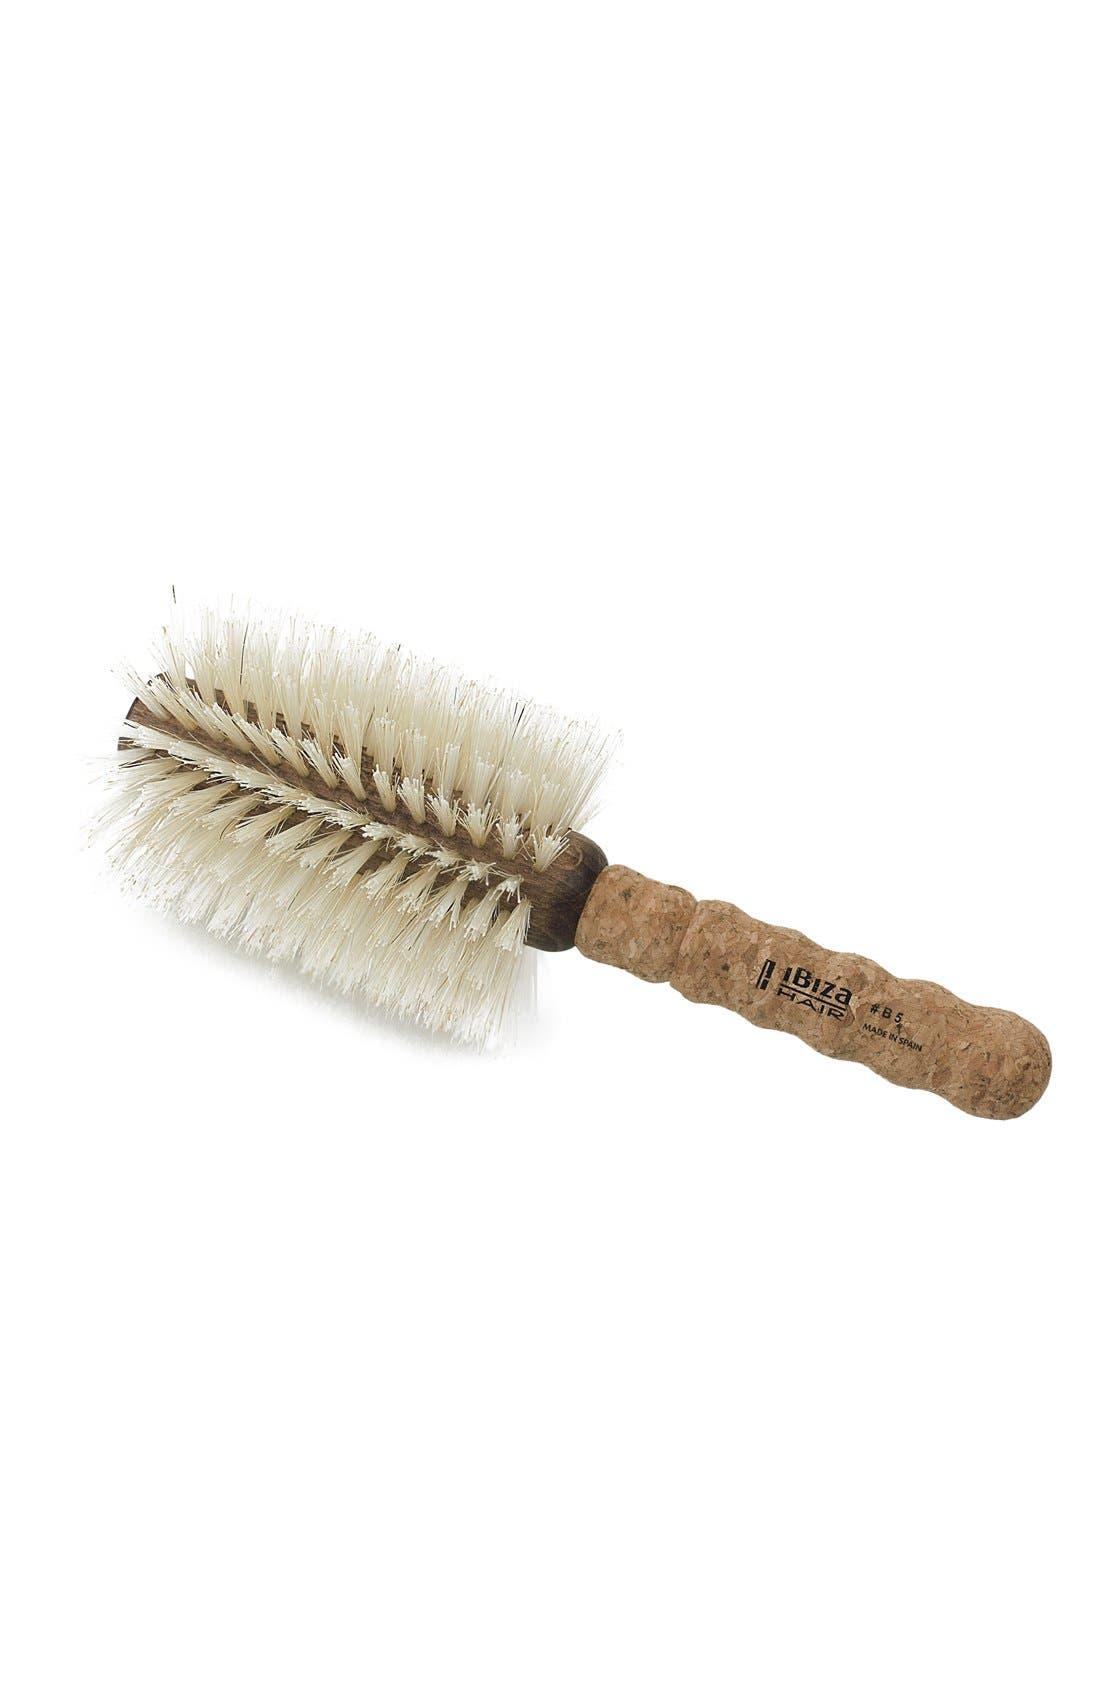 Alternate Image 1 Selected - Ibiza Hair B5 Blonde Extended Cork Round Brush (Extra Large)